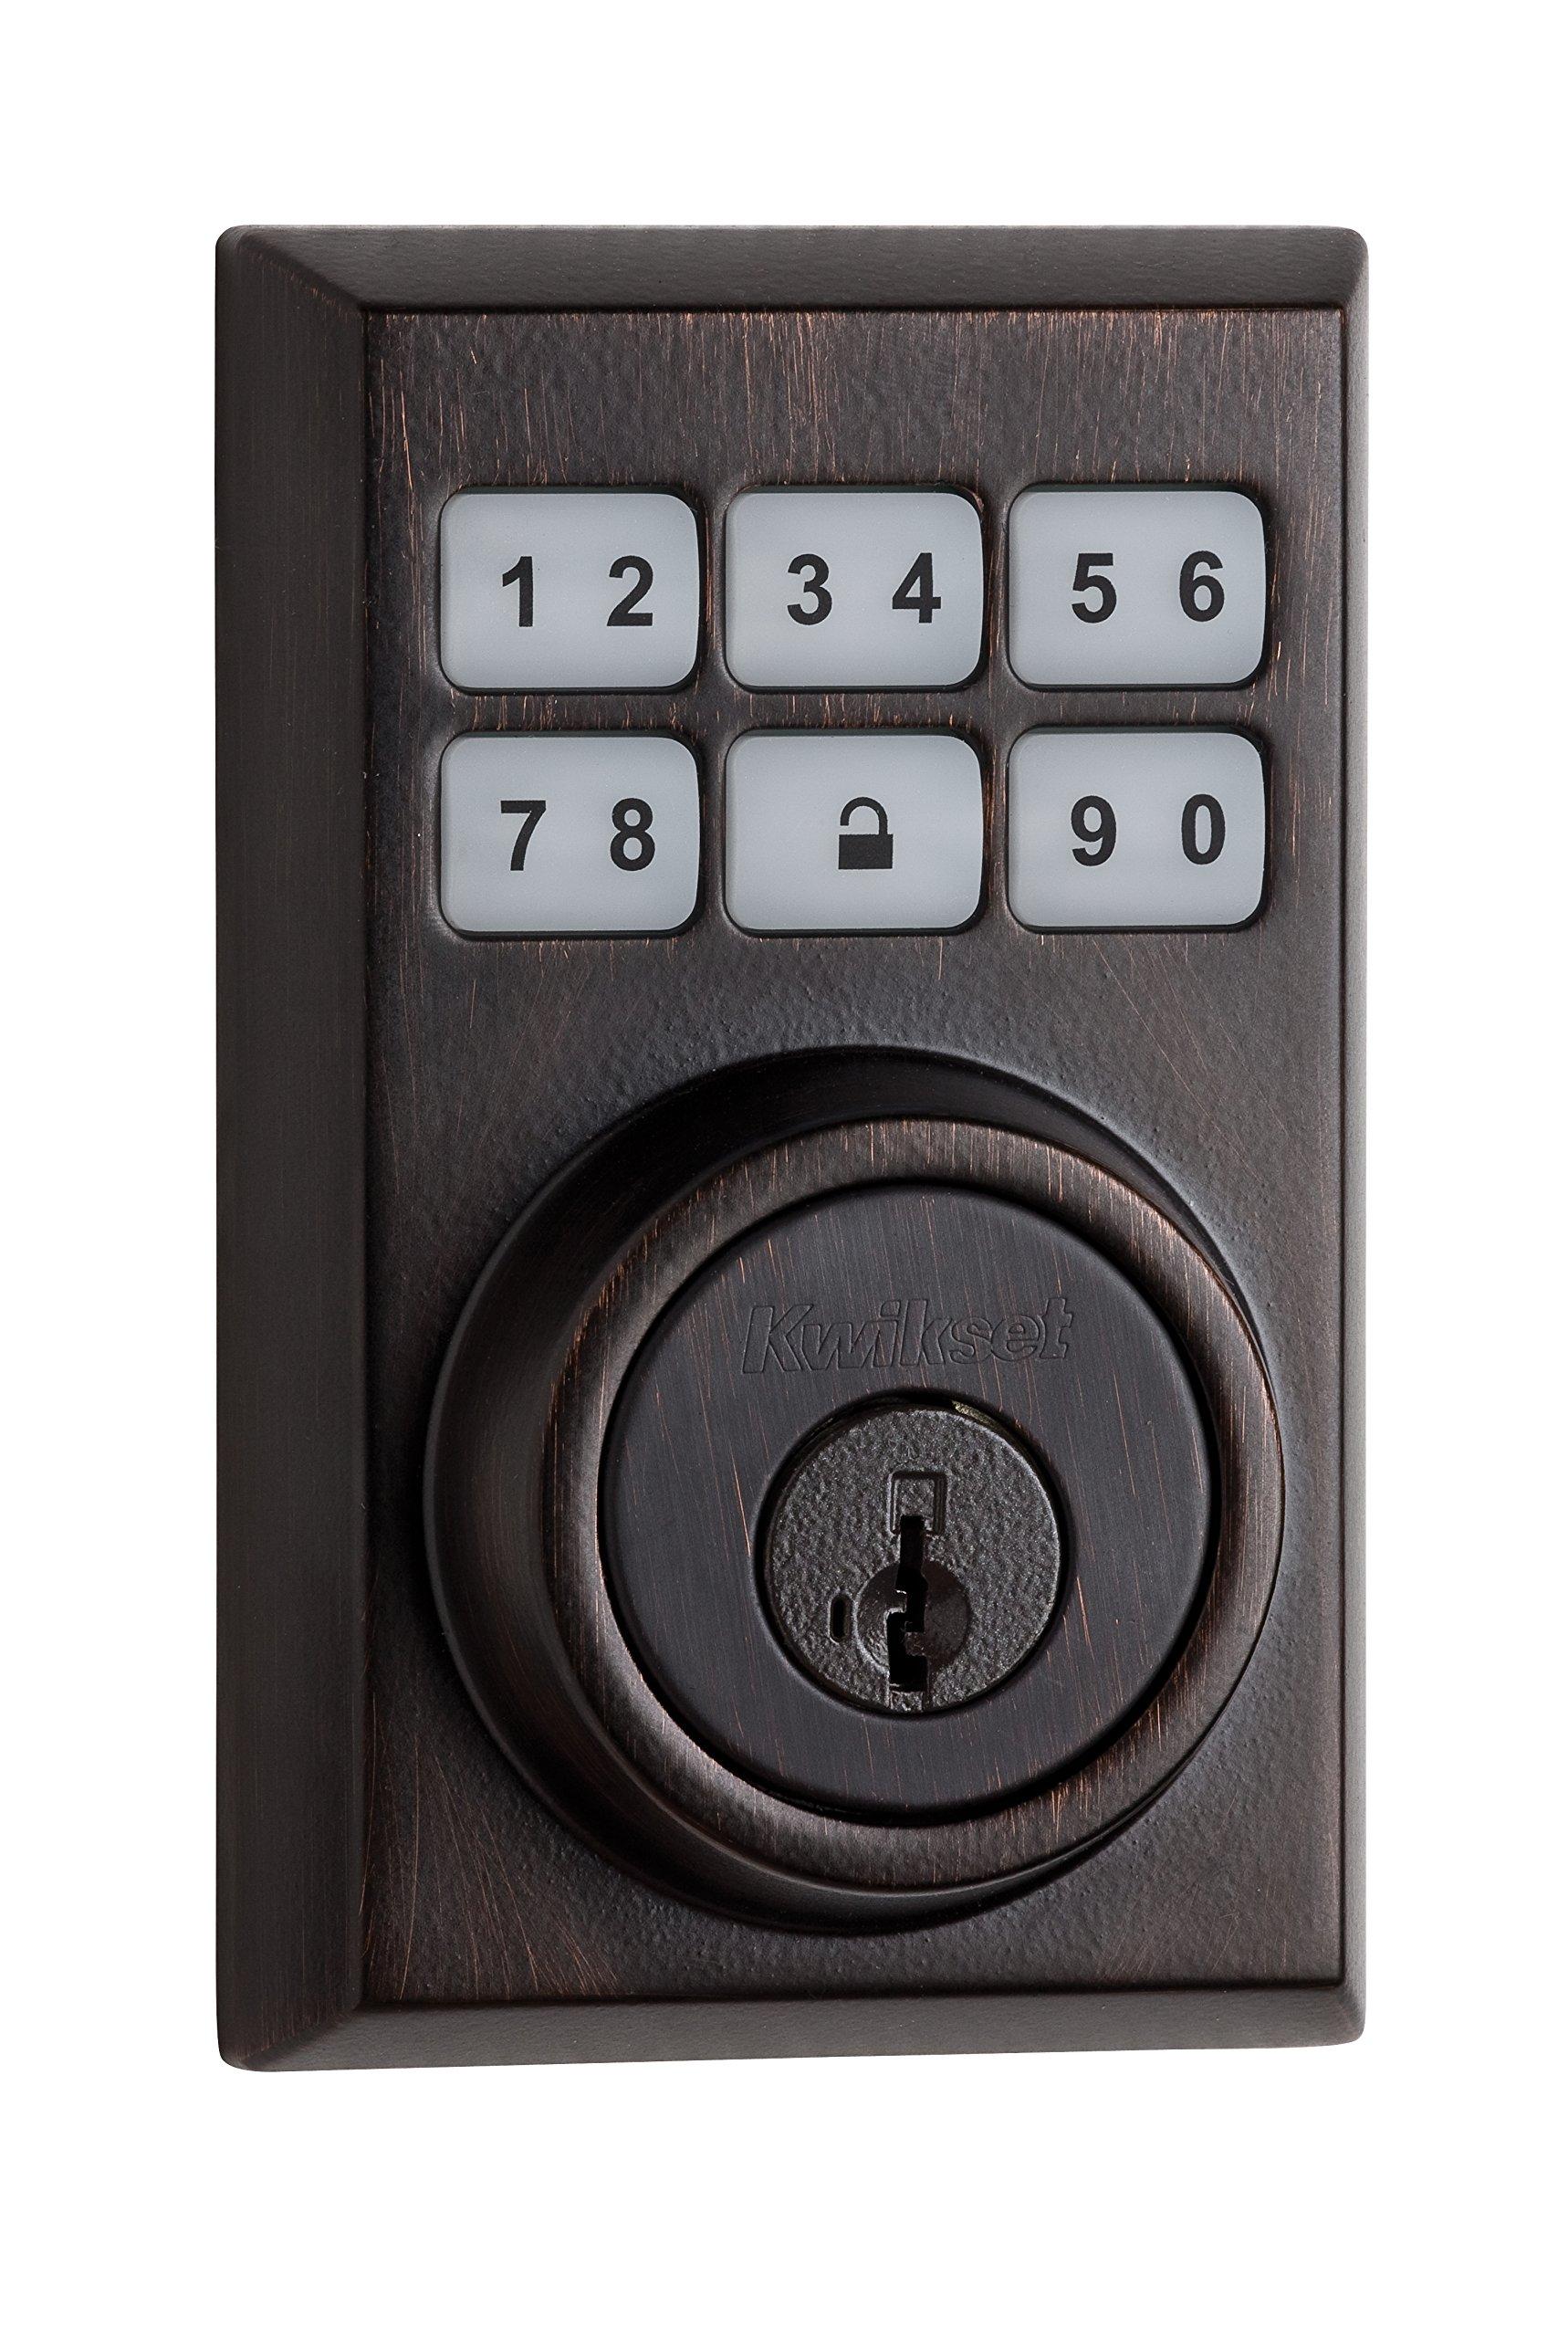 Kwikset 99090-023 SmartCode Electronic Deadbolt featuring Smart Key, Venetian Bronze